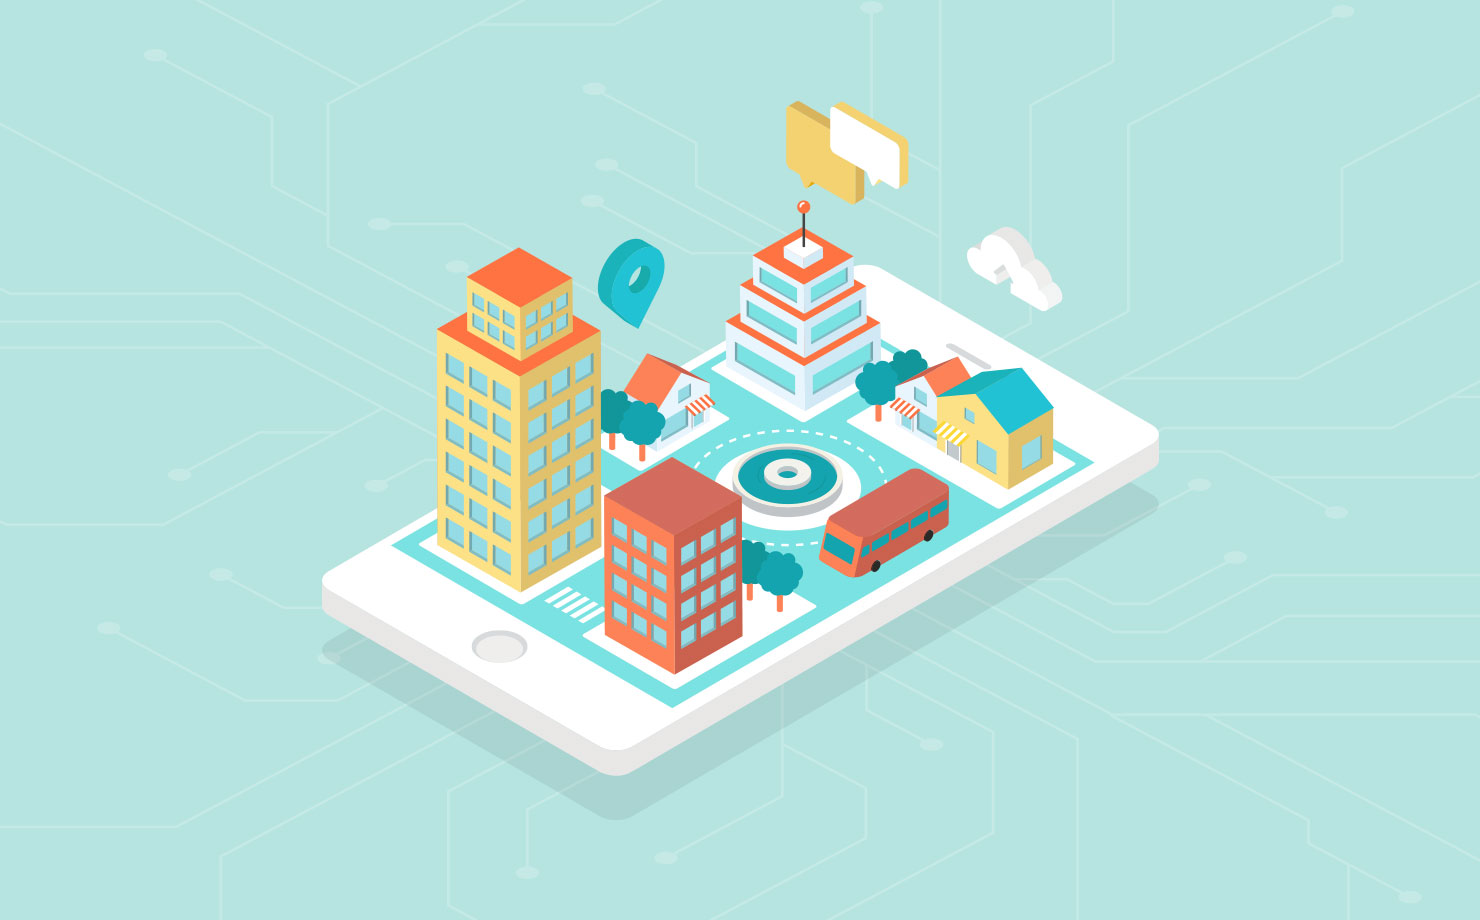 Information about neighborhood